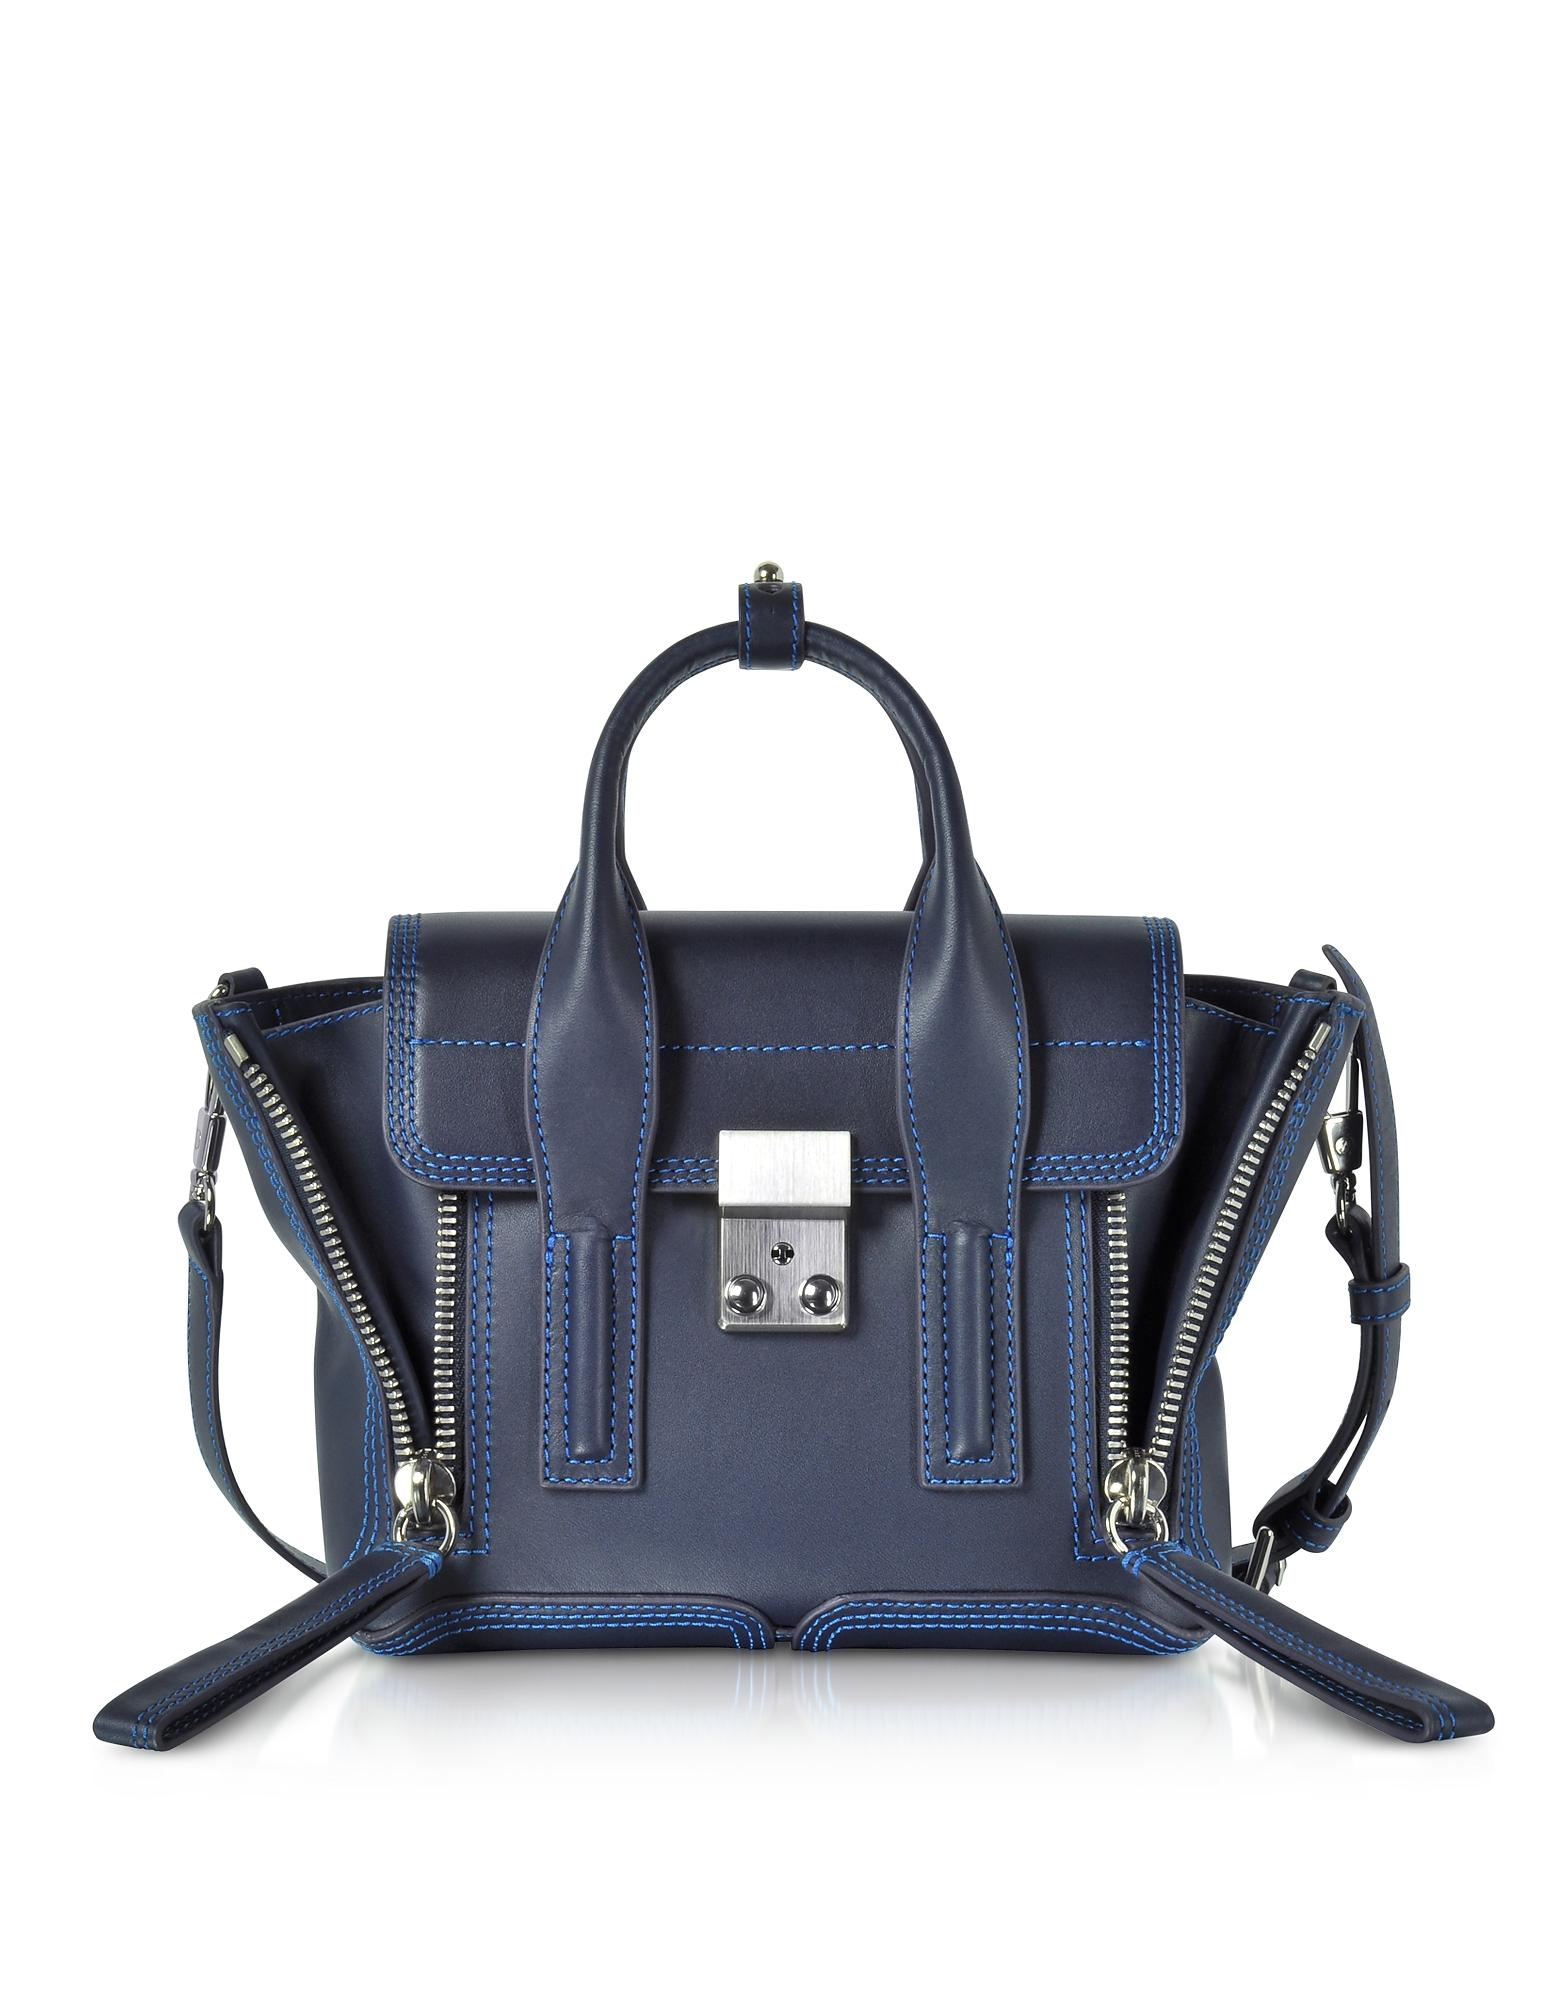 3.1 Phillip Lim Handbags, Navy & Electric Blue Pashli Mini Satchel